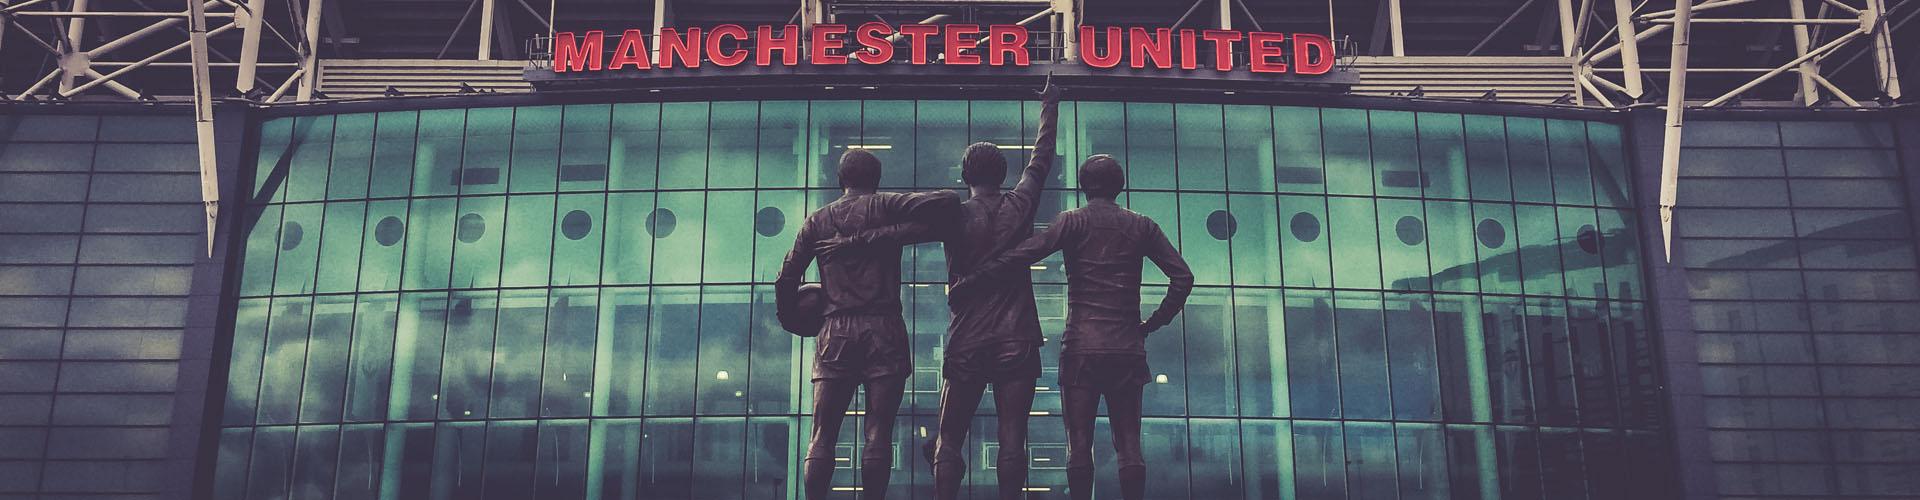 Old Trafford Statue